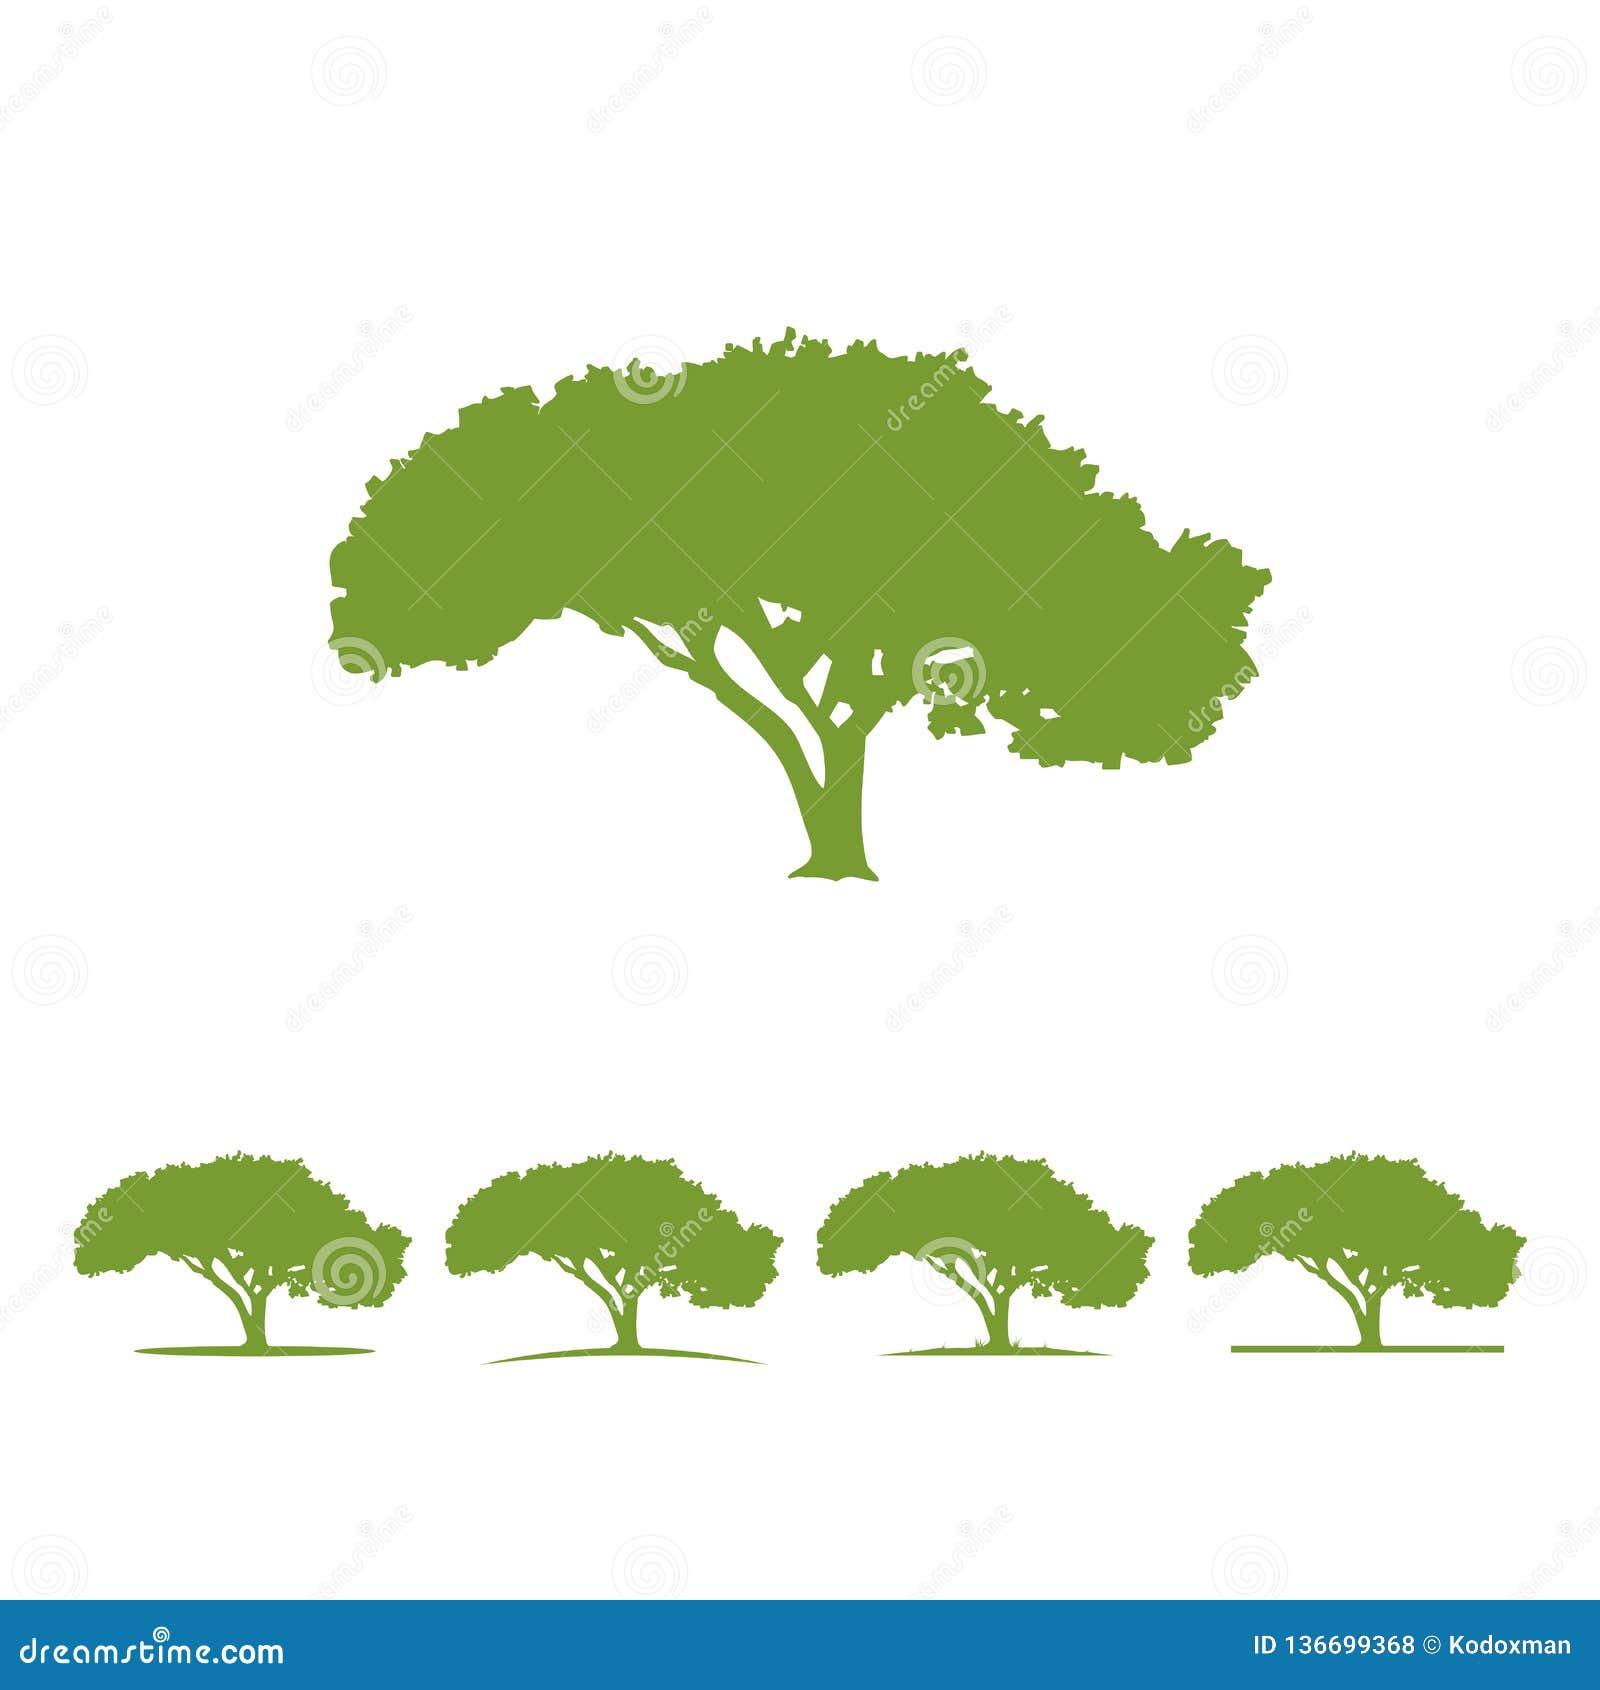 Tree logo illustration Vector silhouette